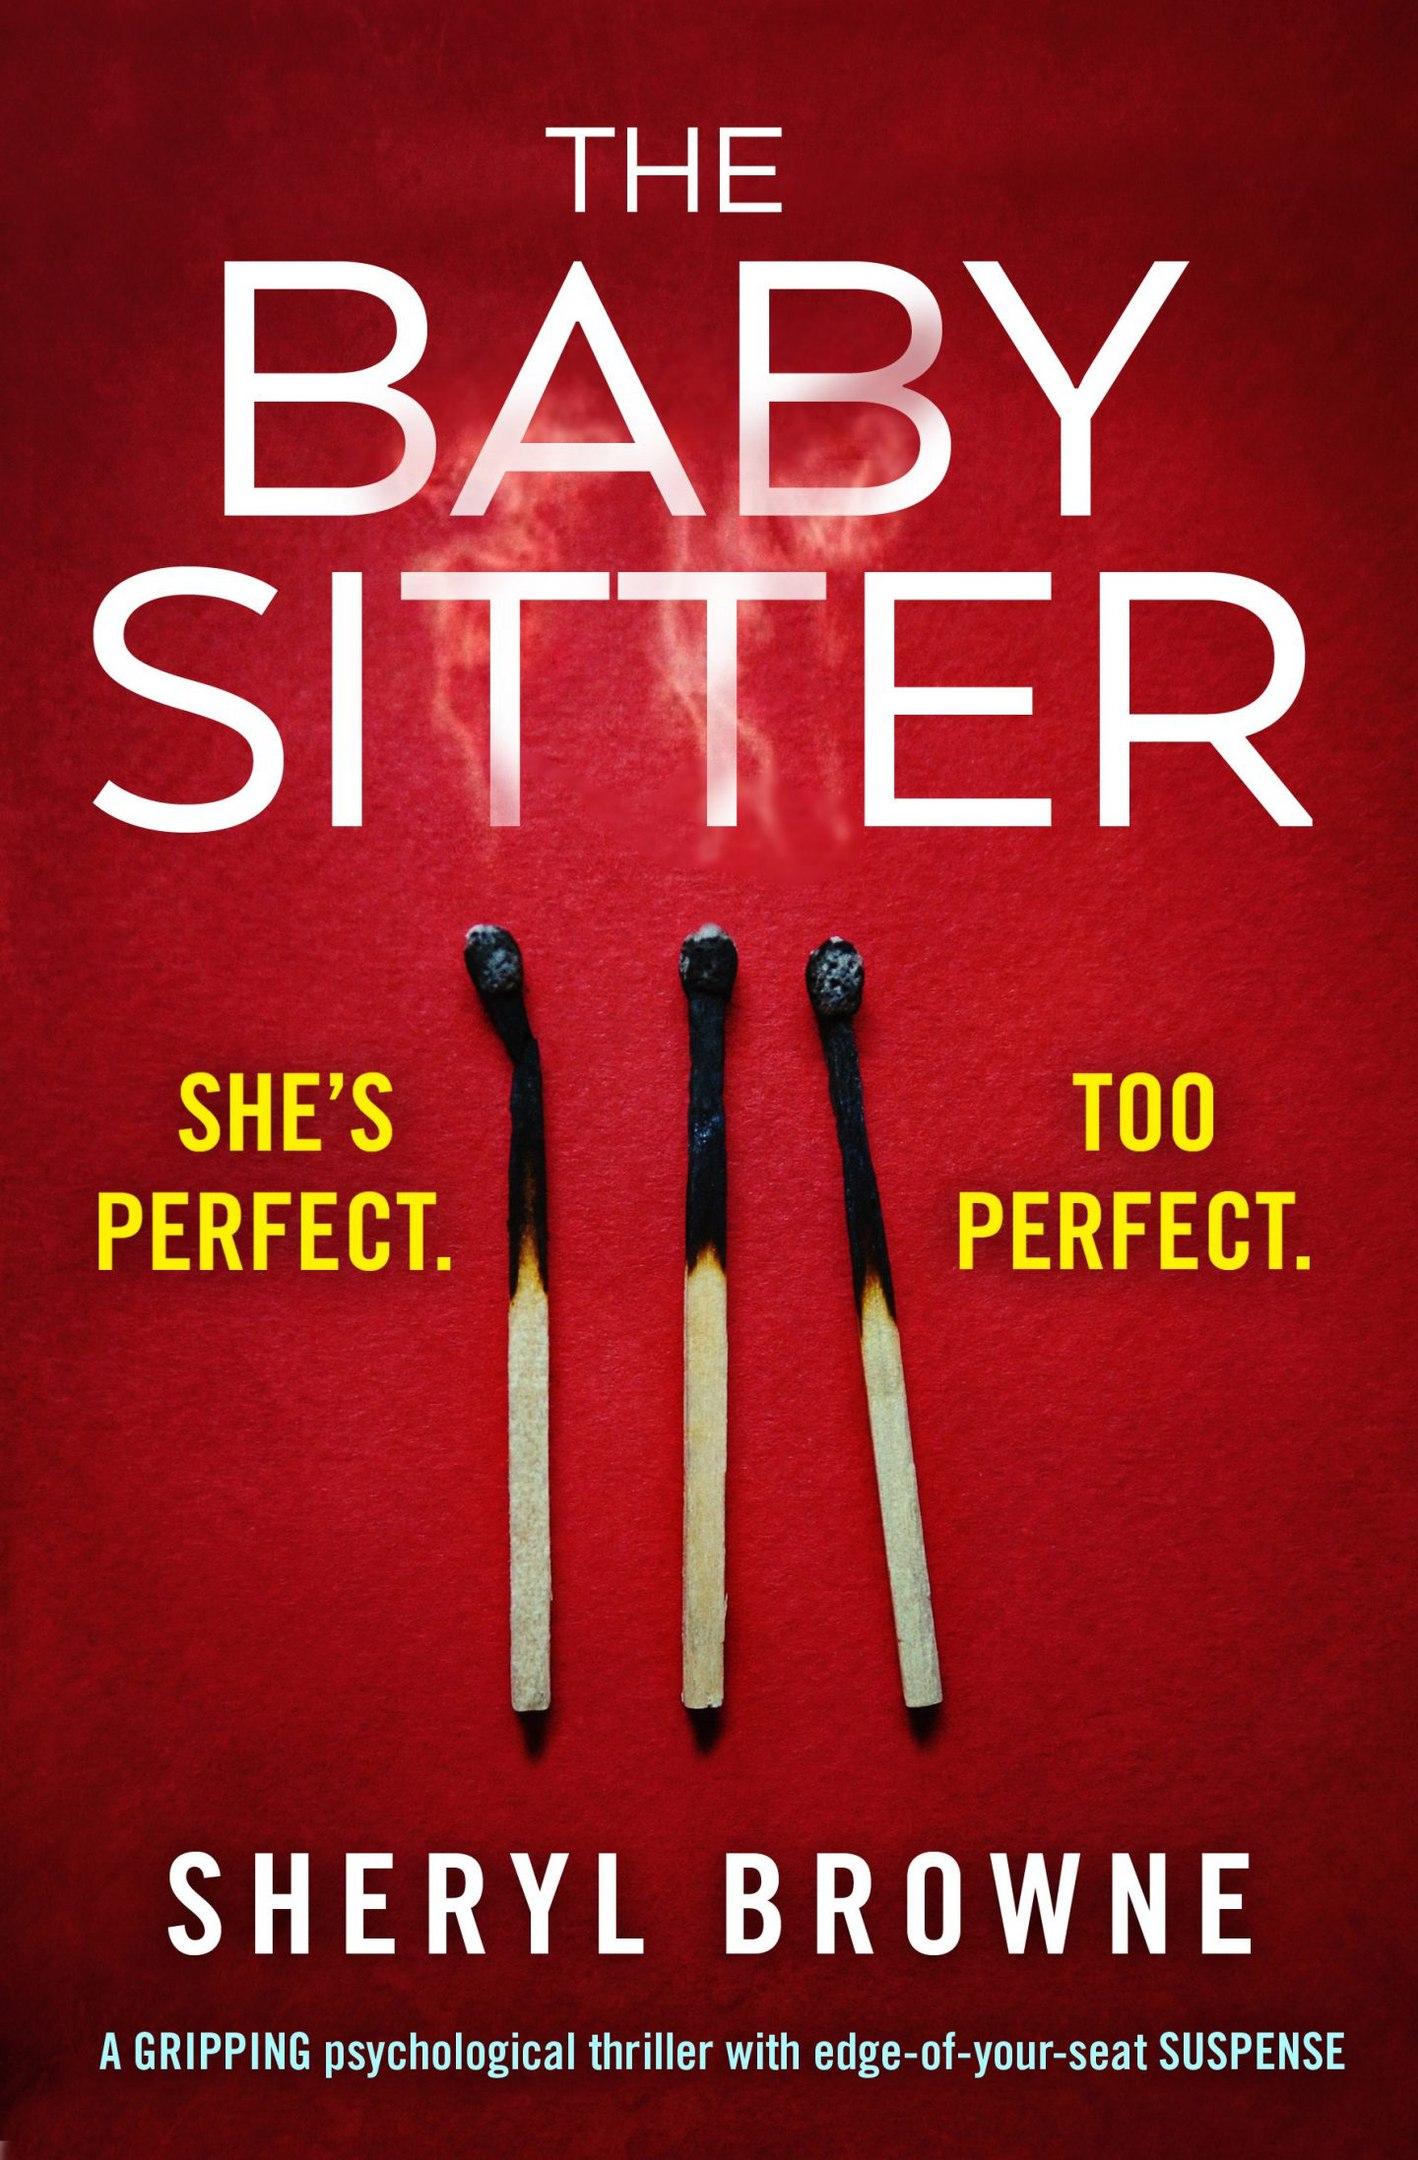 Sheryl Browne – The Babysitter